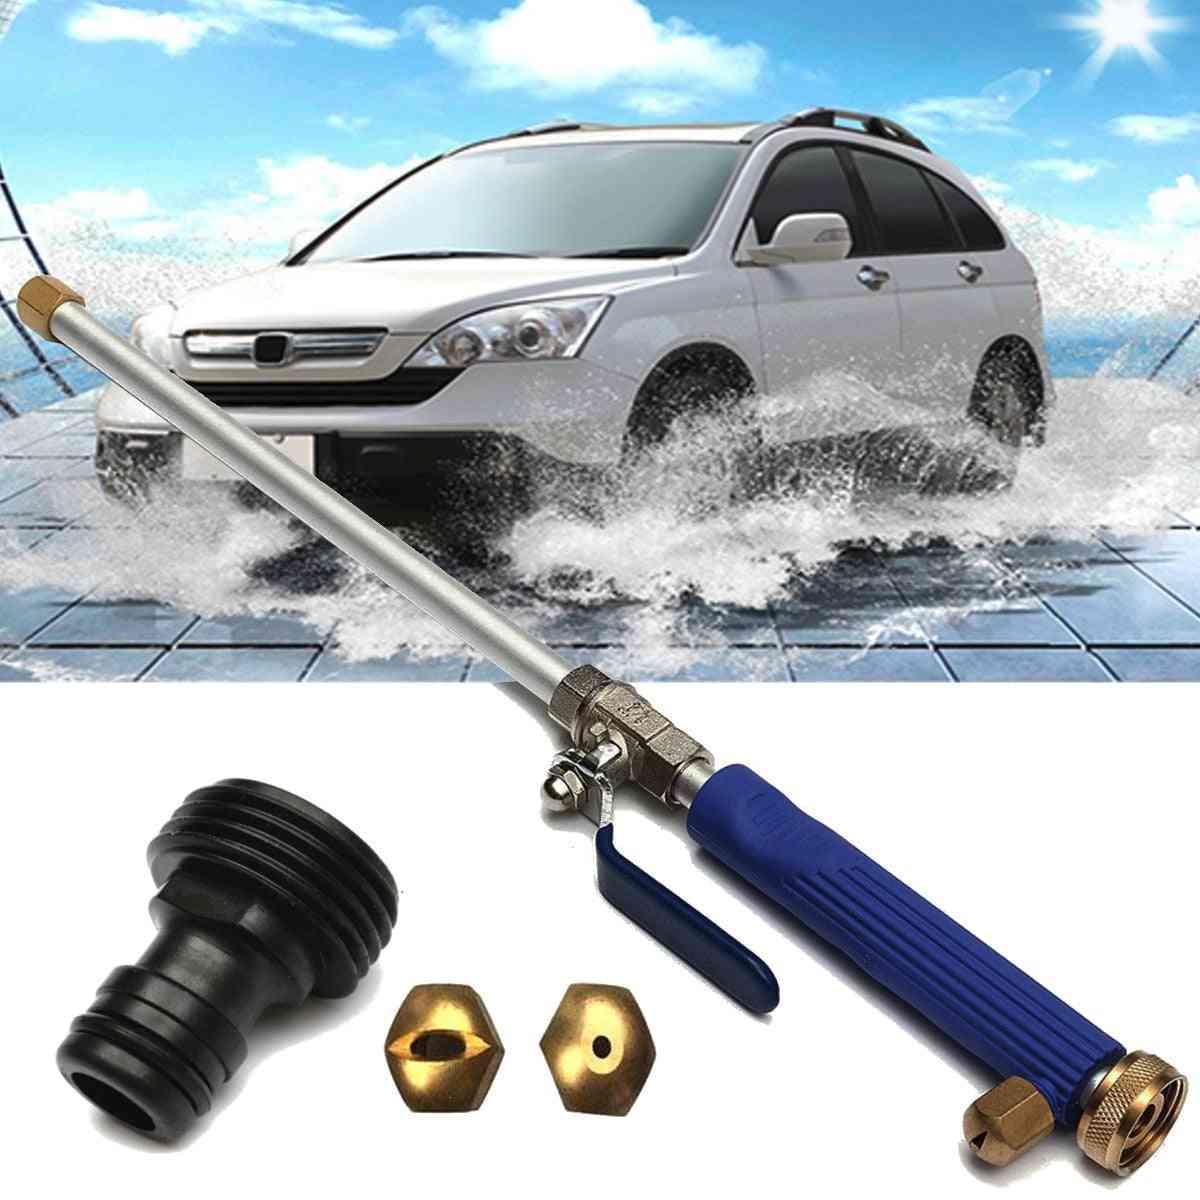 Aluminium High Pressure Power Car Washer Spray Nozzle Water Gun Hose Wand Attachment W/tips